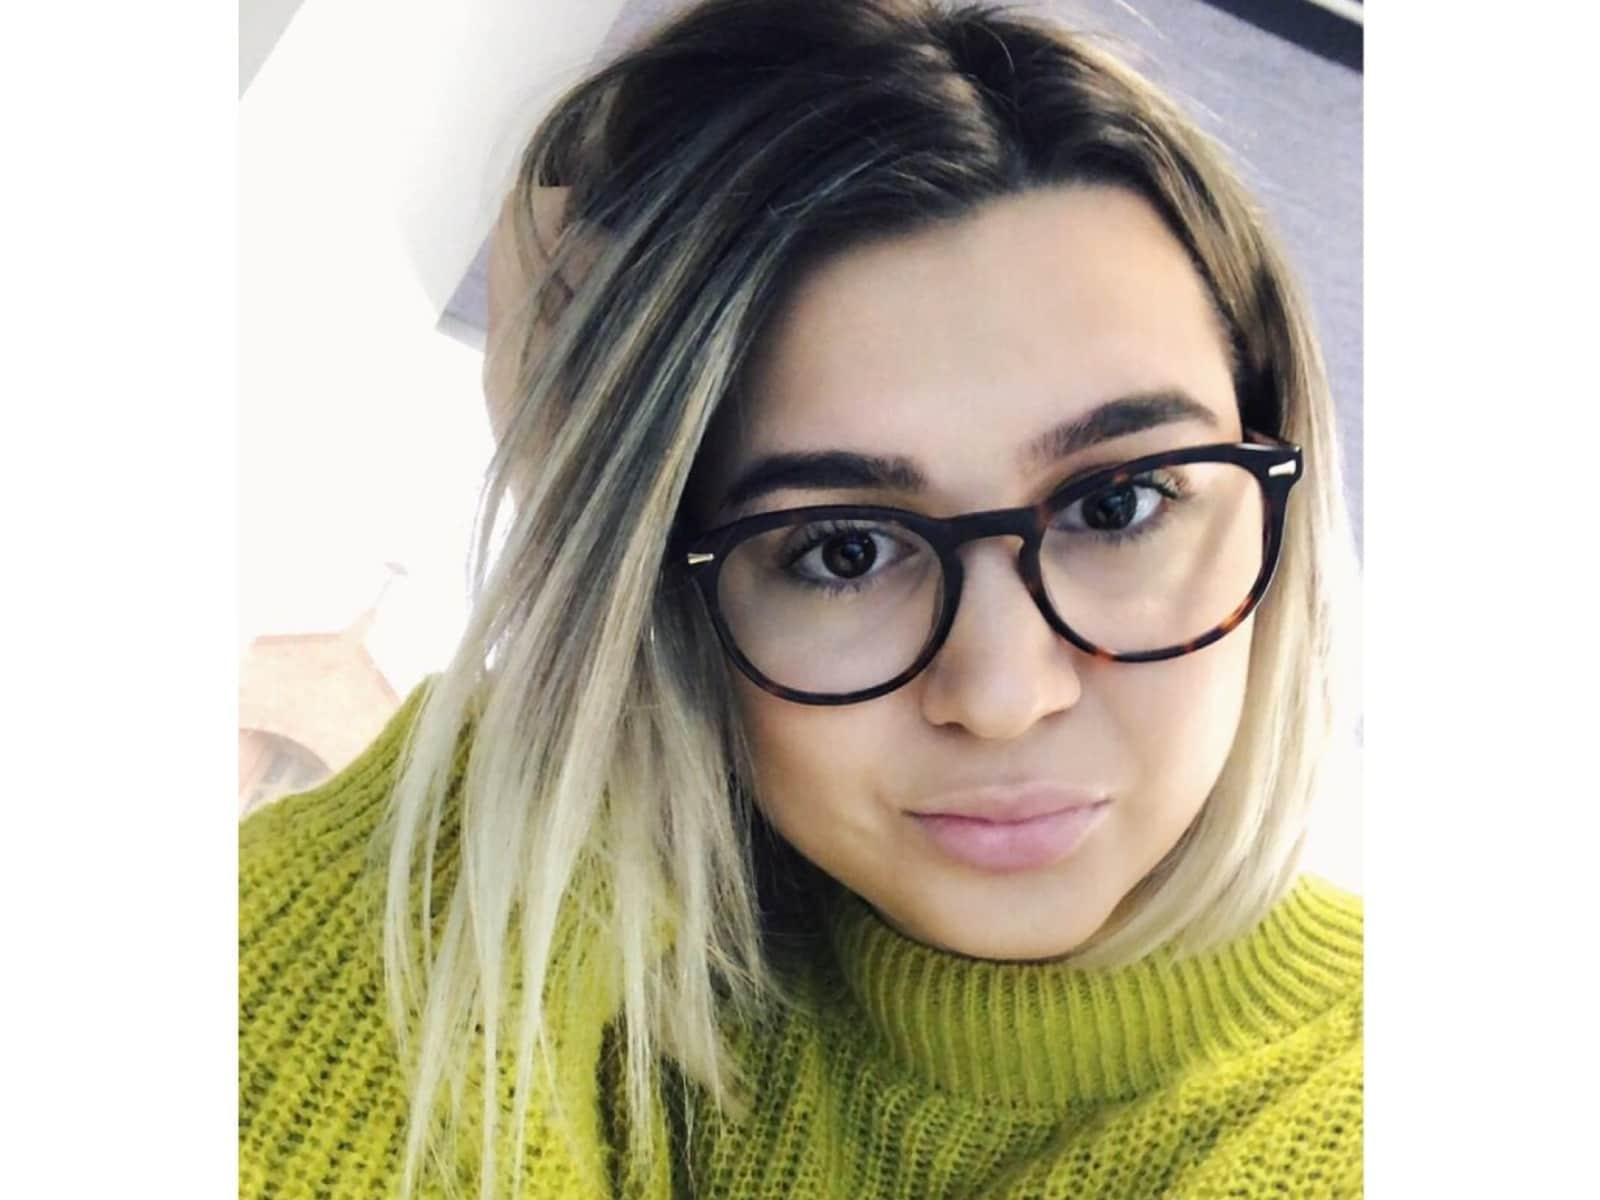 Karina from Templestowe Lower, Victoria, Australia